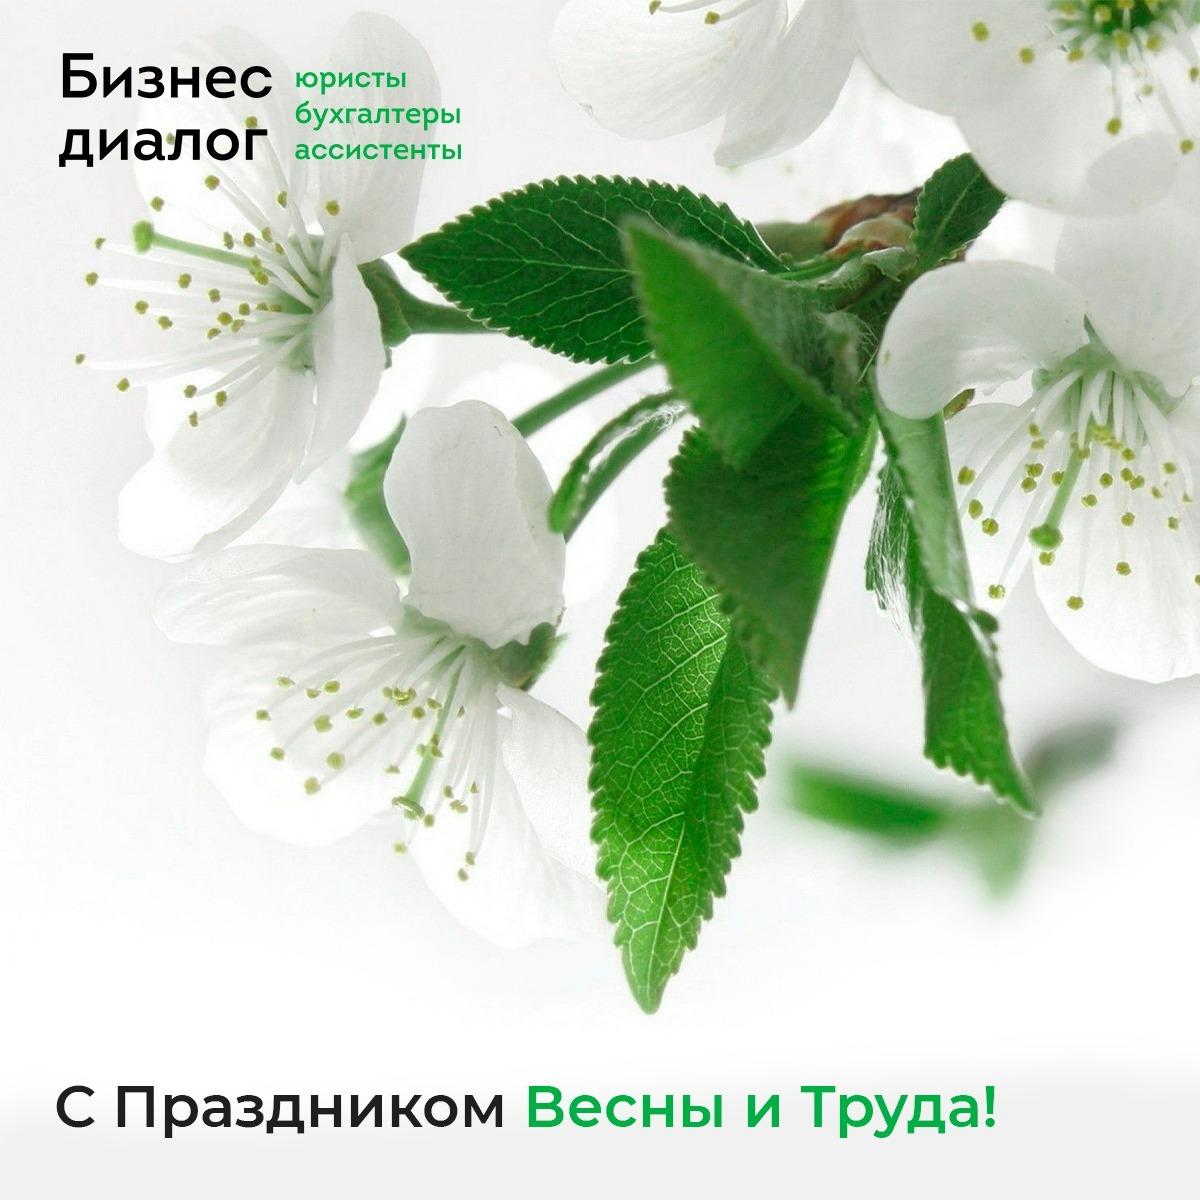 С 1 мая. Бизнес Диалог. ubk-bd.ru